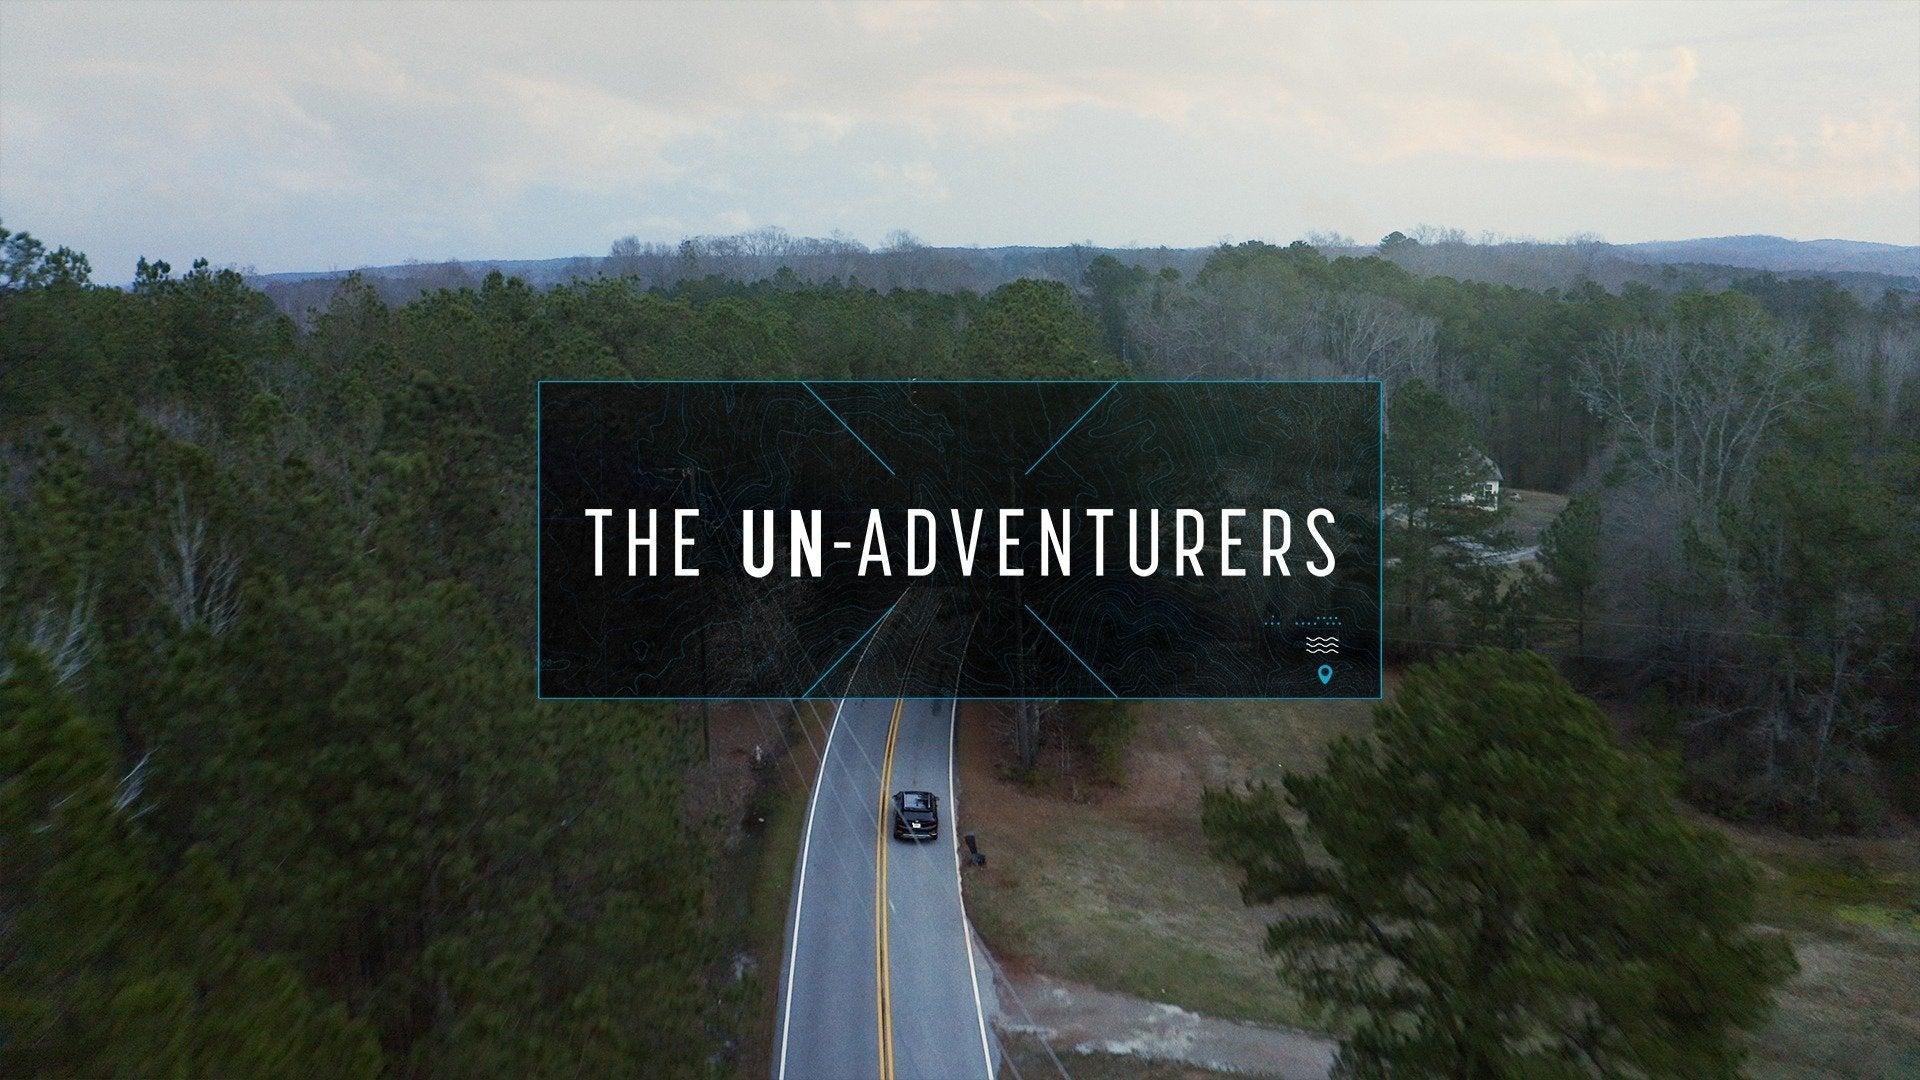 The Un-Adventurers